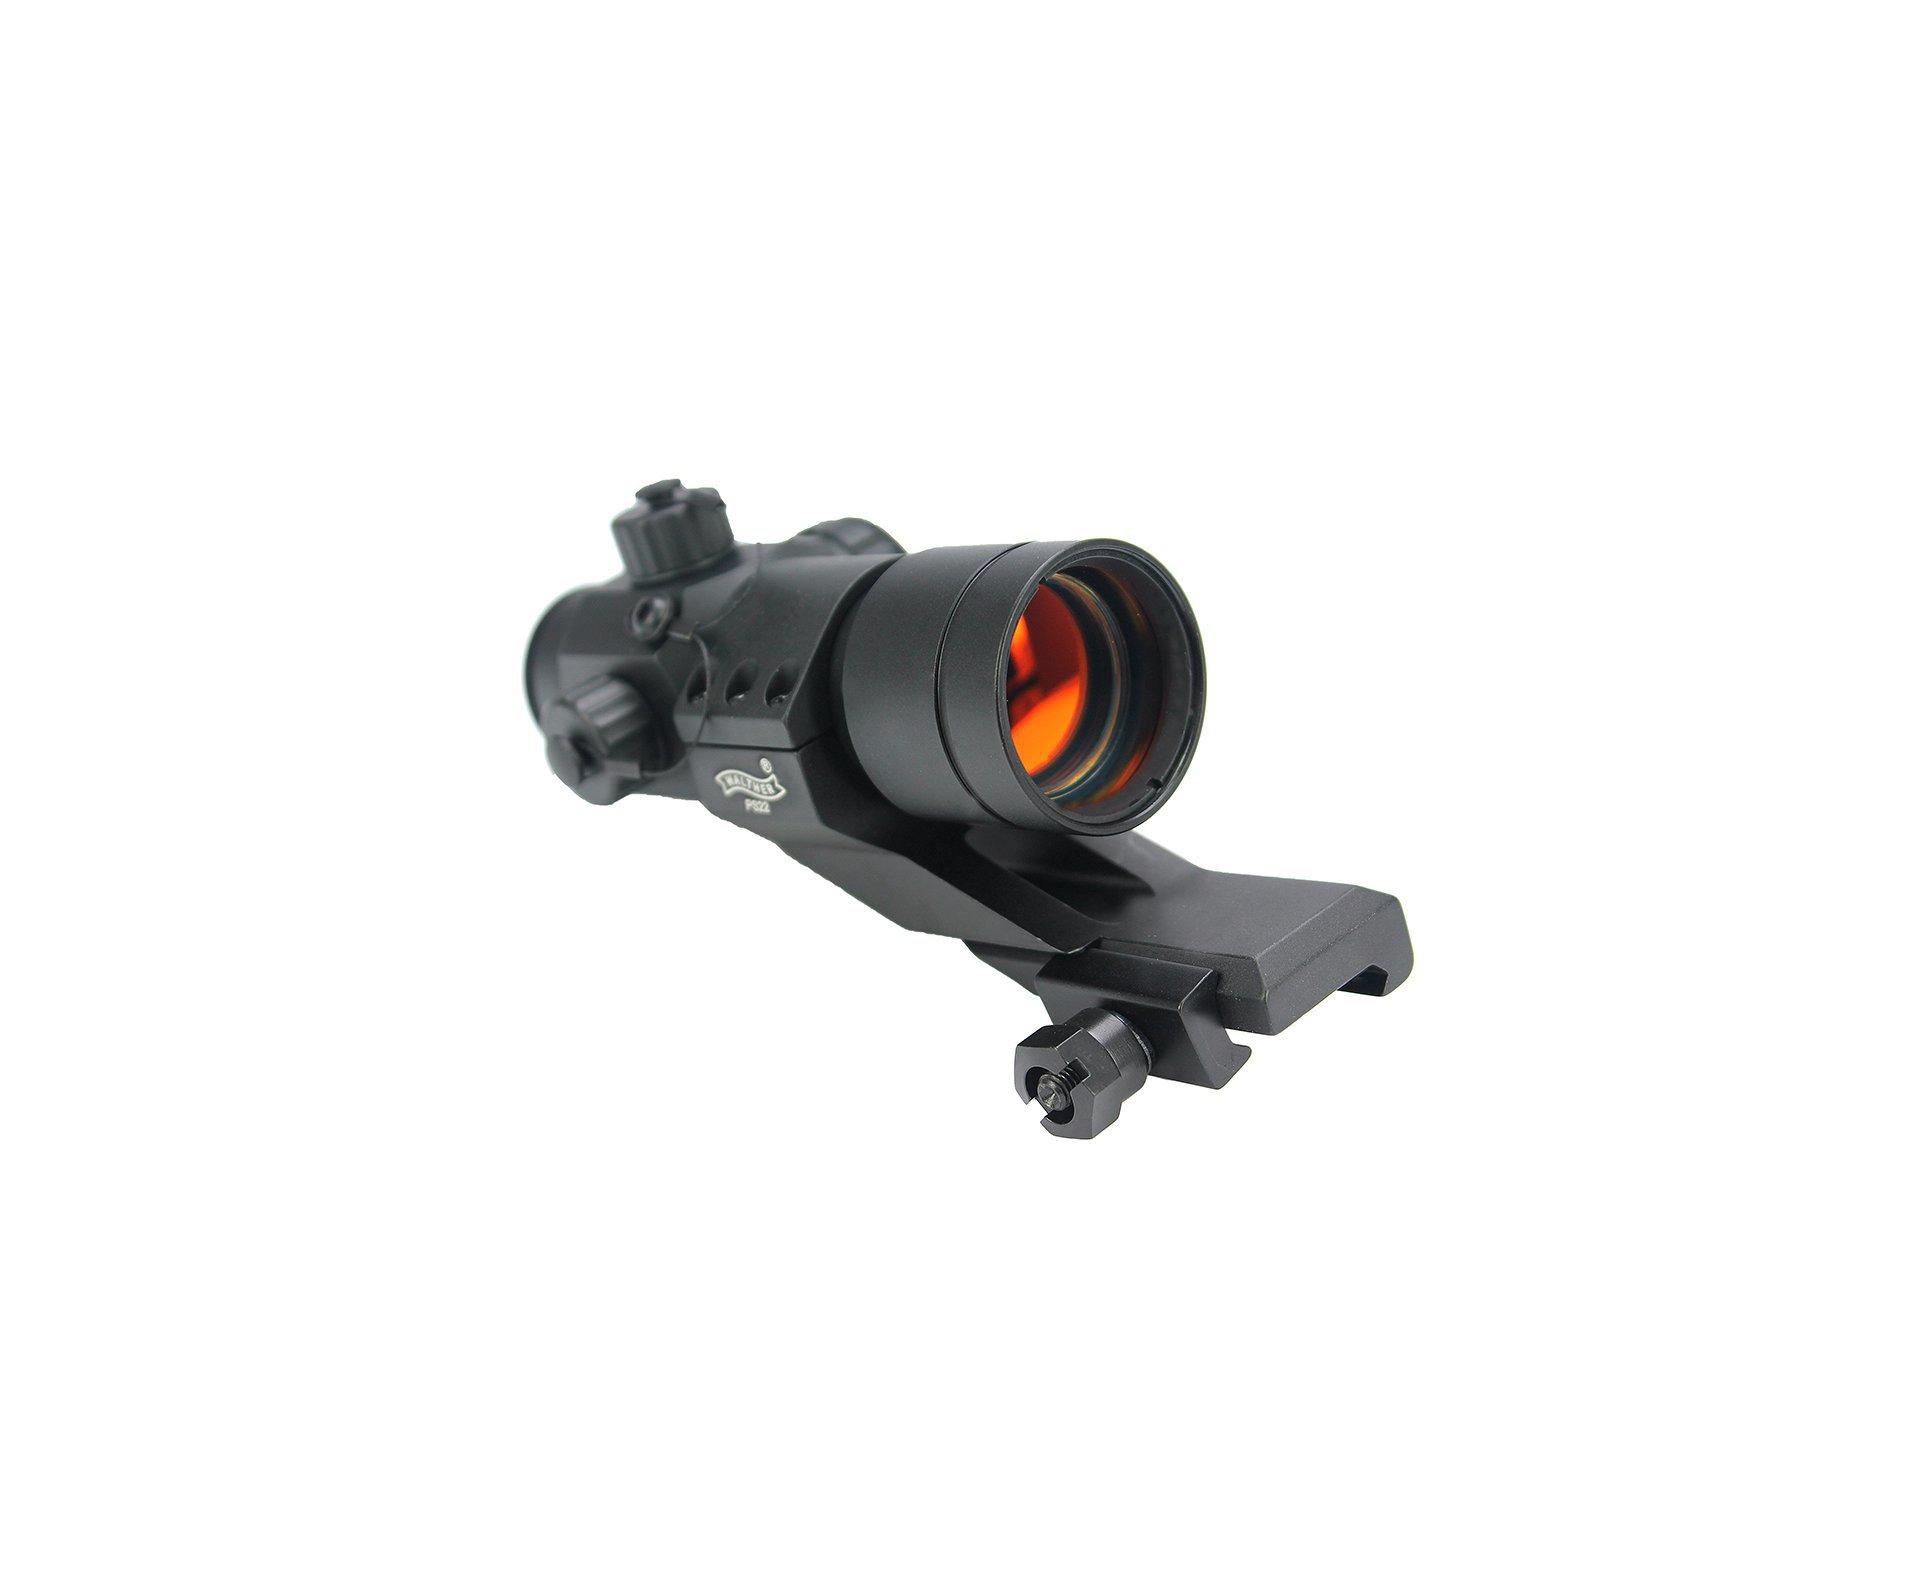 Mira Holografica Walther Ps22 Para Pistolas (red Dot)